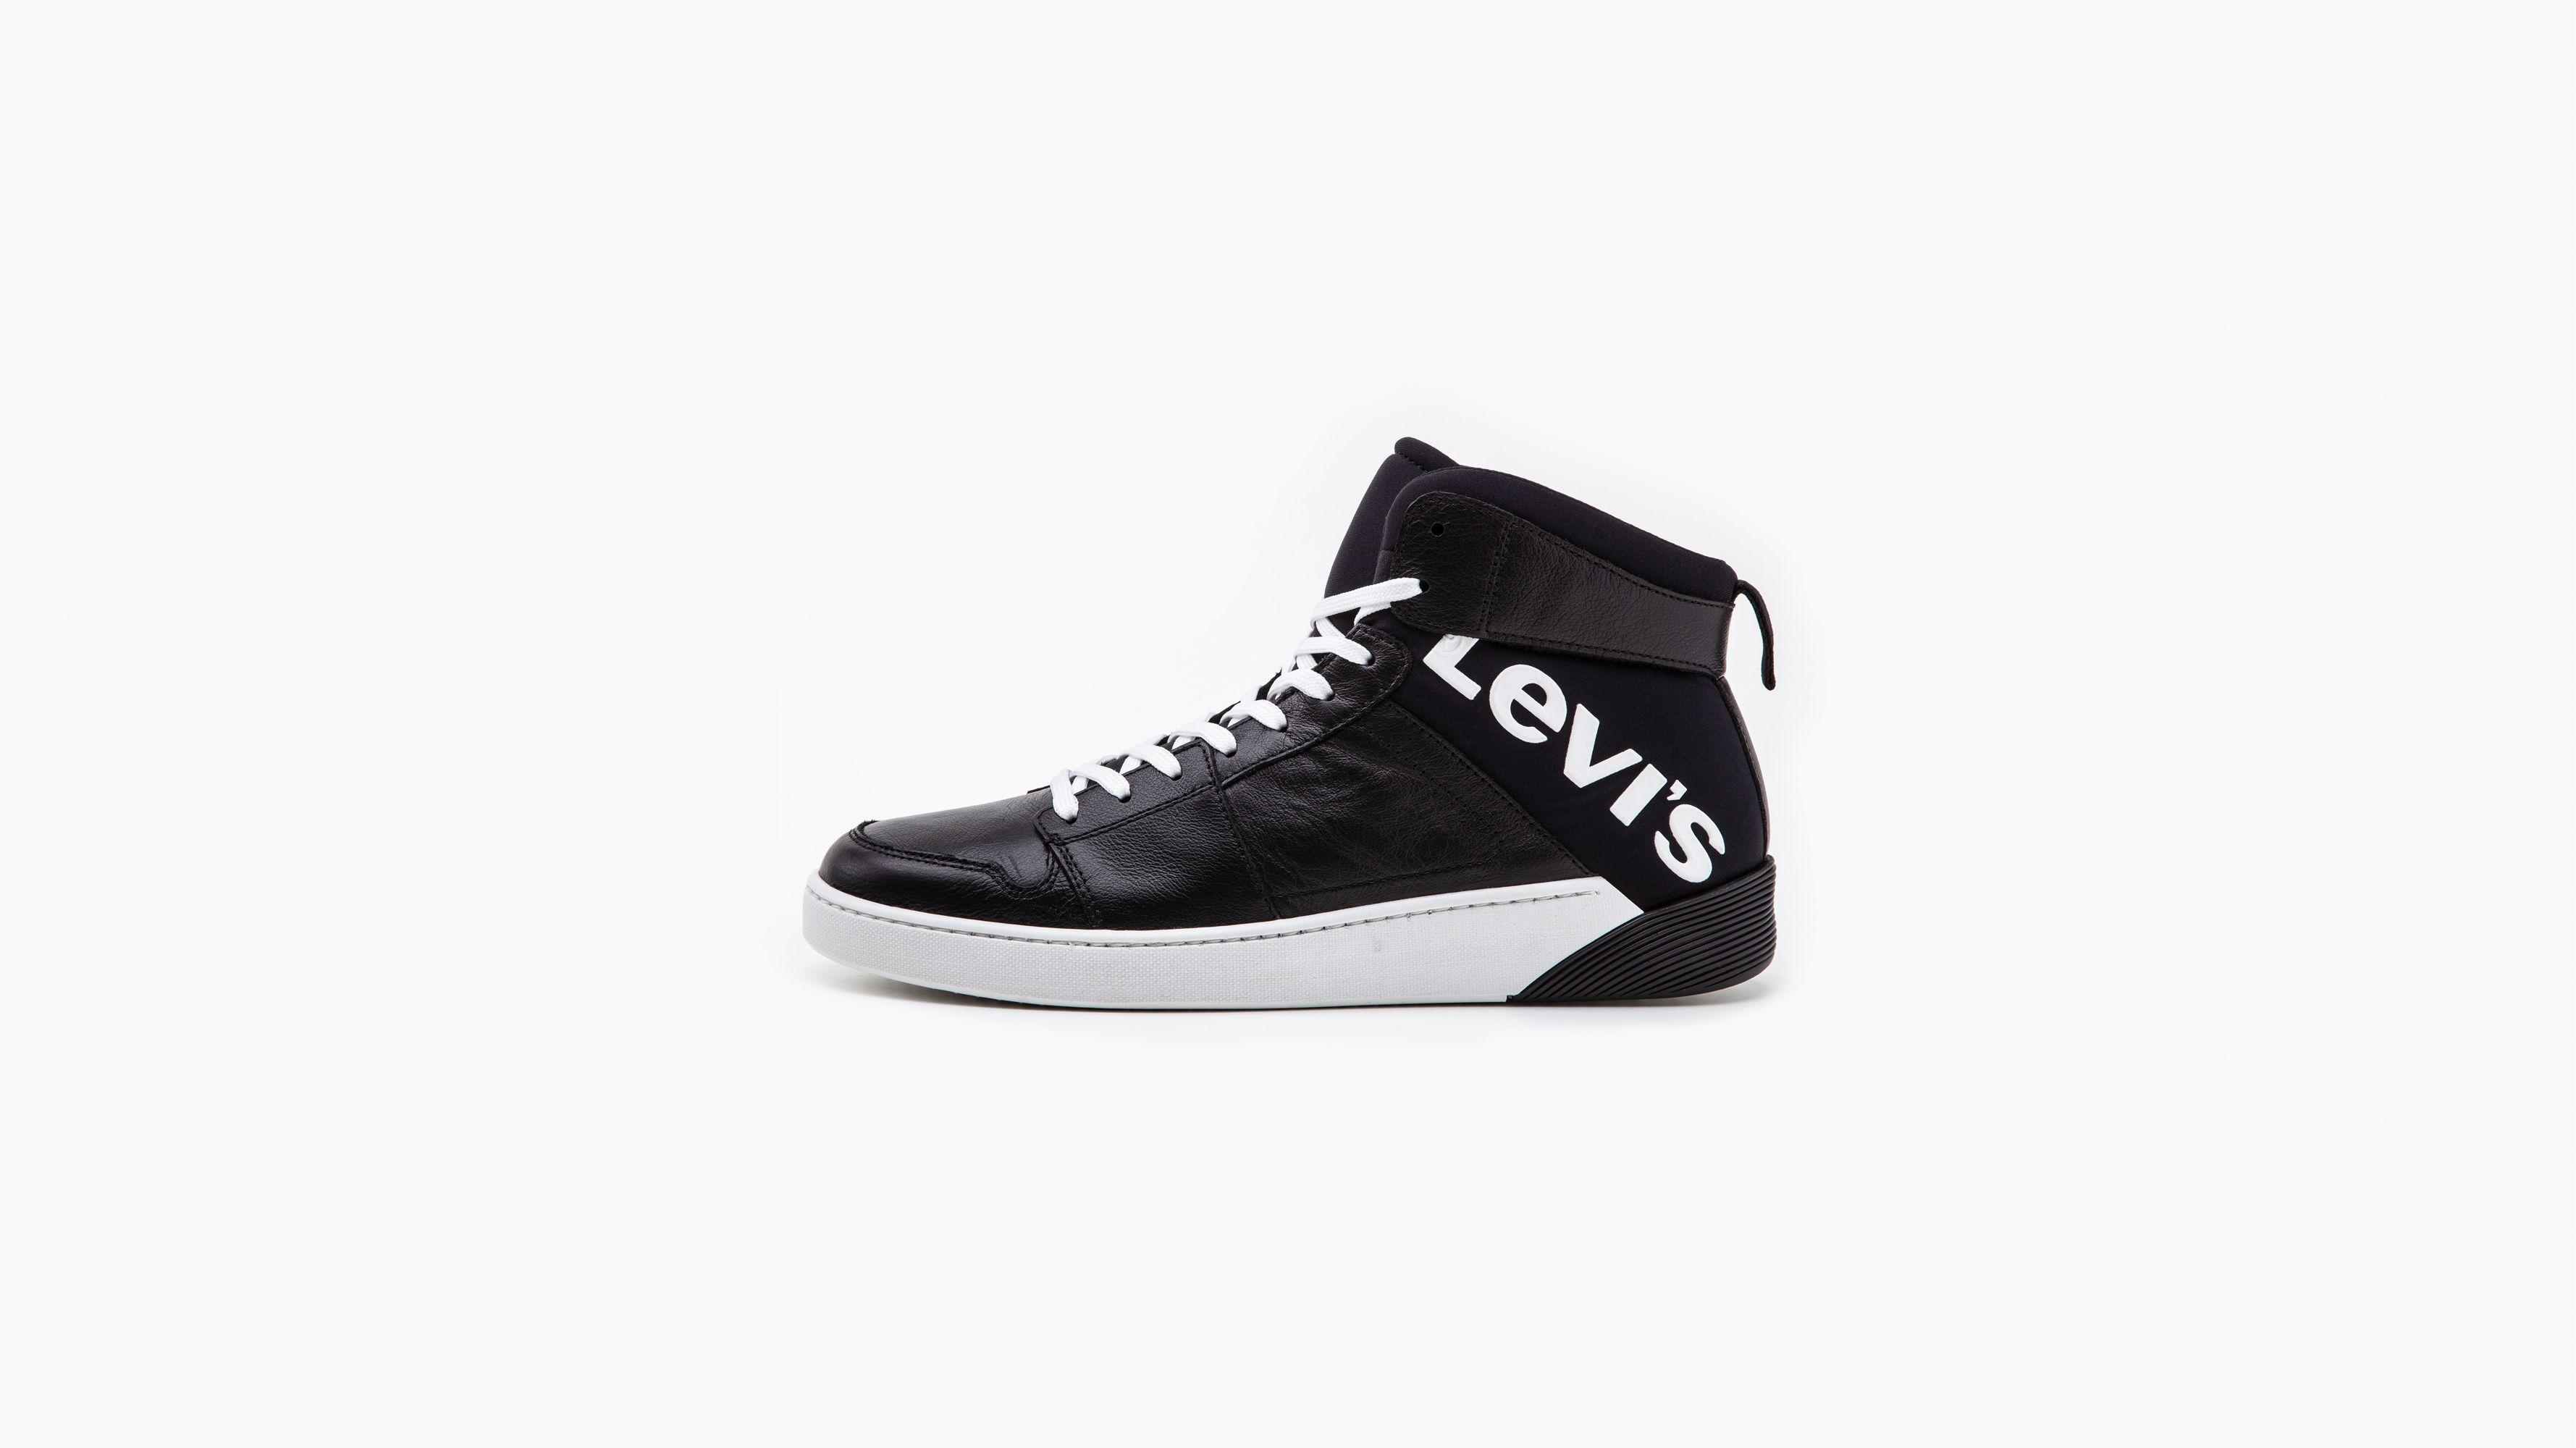 Schwarz Details Socken Jun Sneaker Herren Schuhe Sportliche